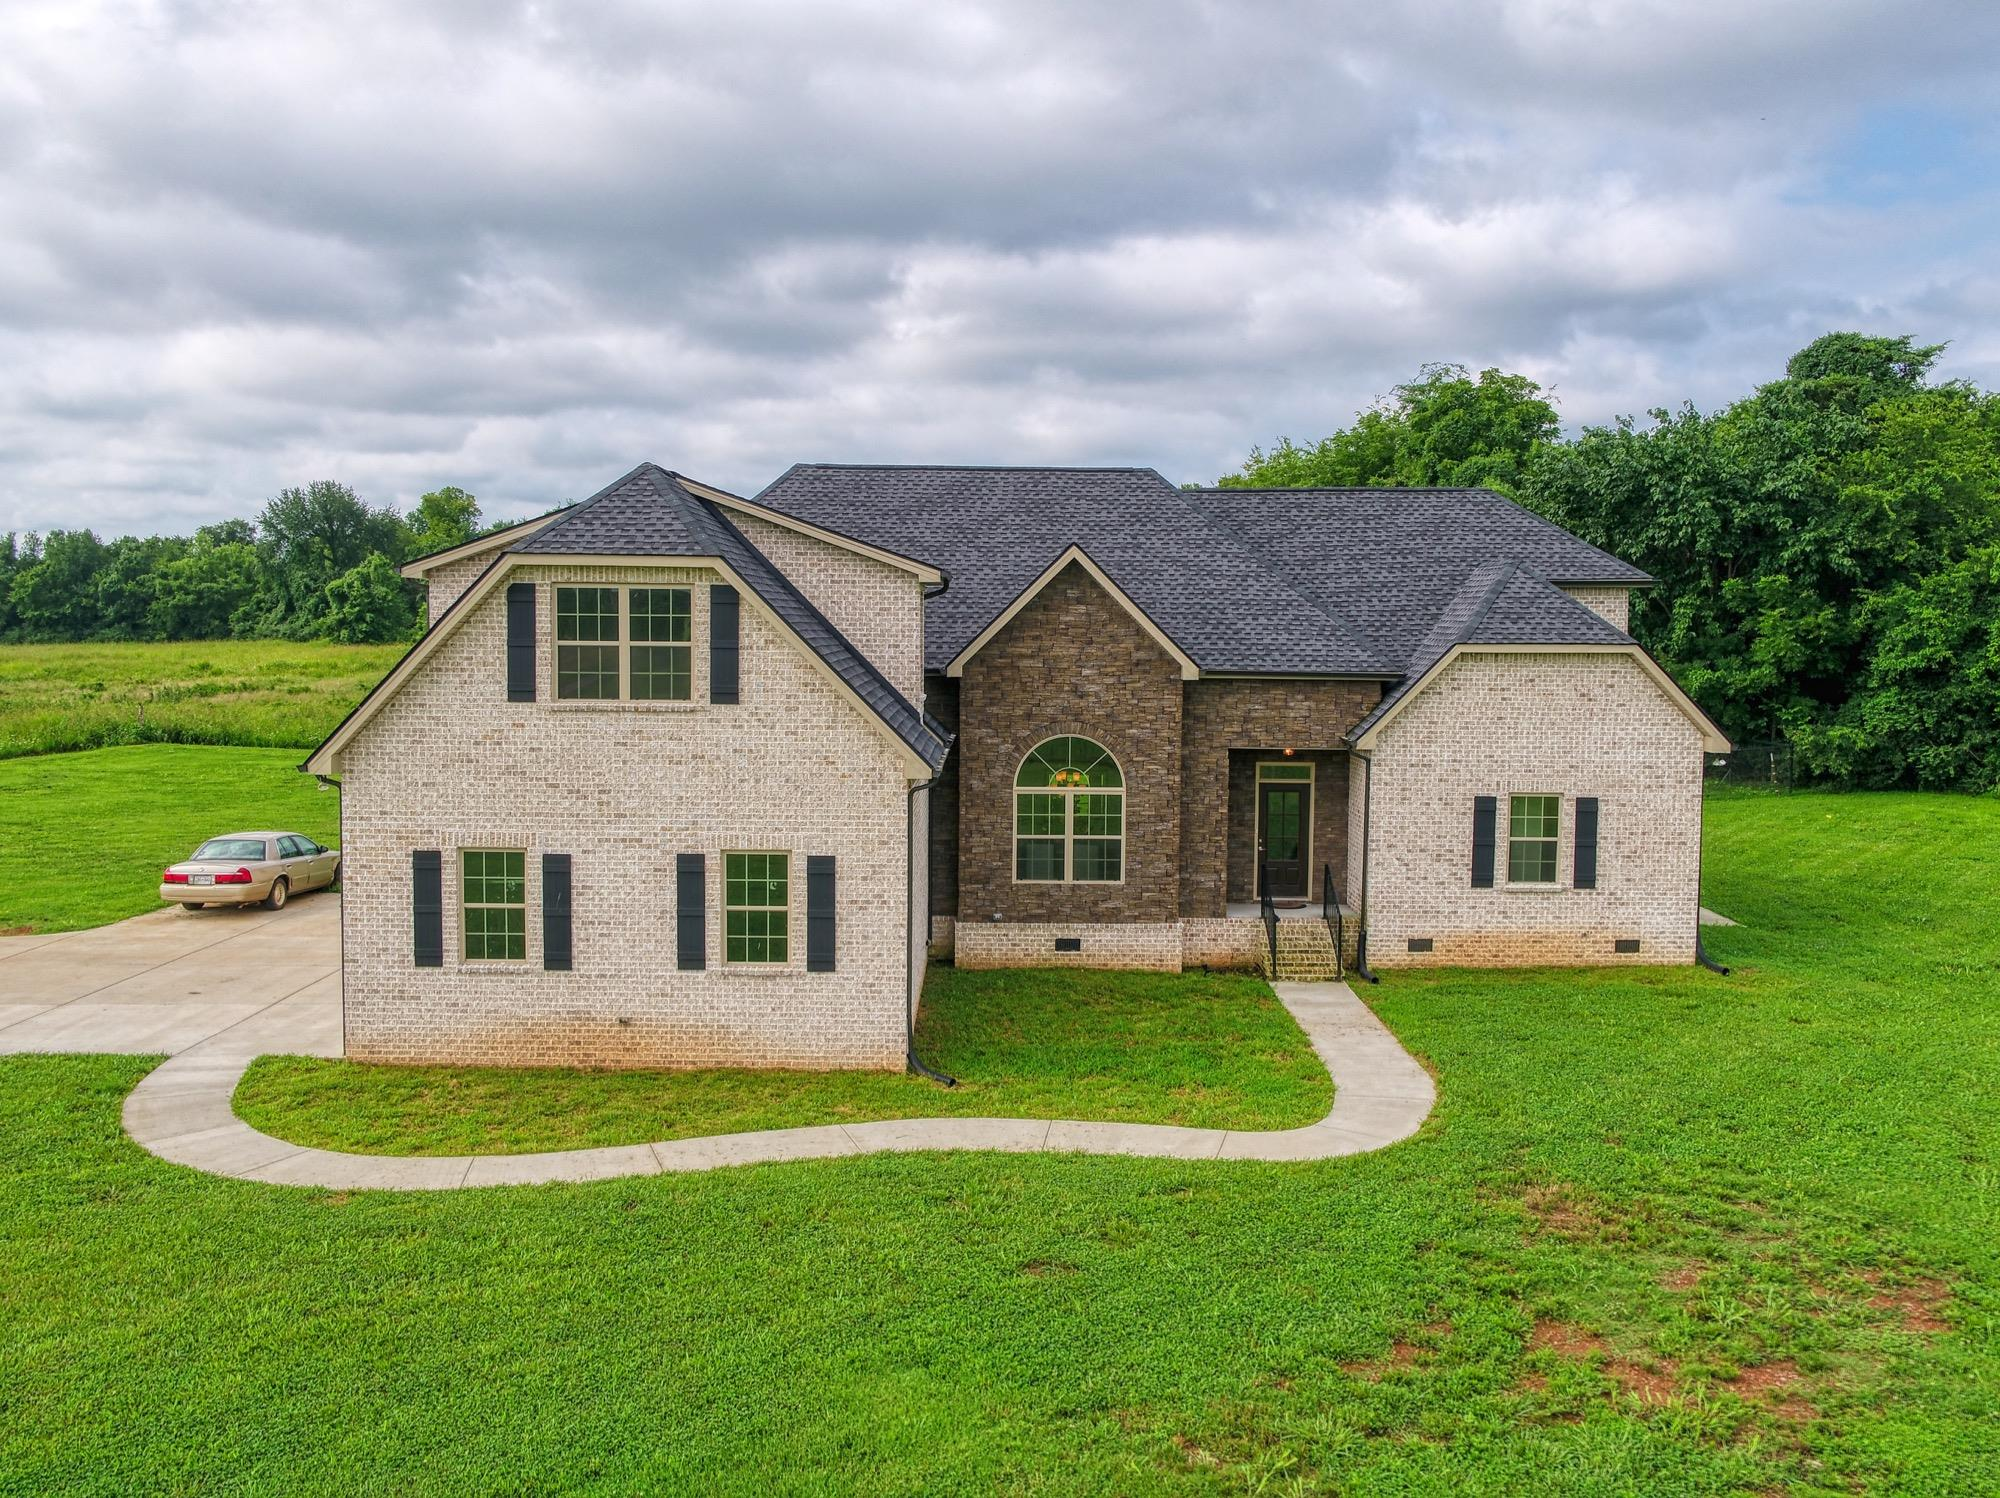 1390 Compton Rd, Murfreesboro, TN 37130 - Murfreesboro, TN real estate listing